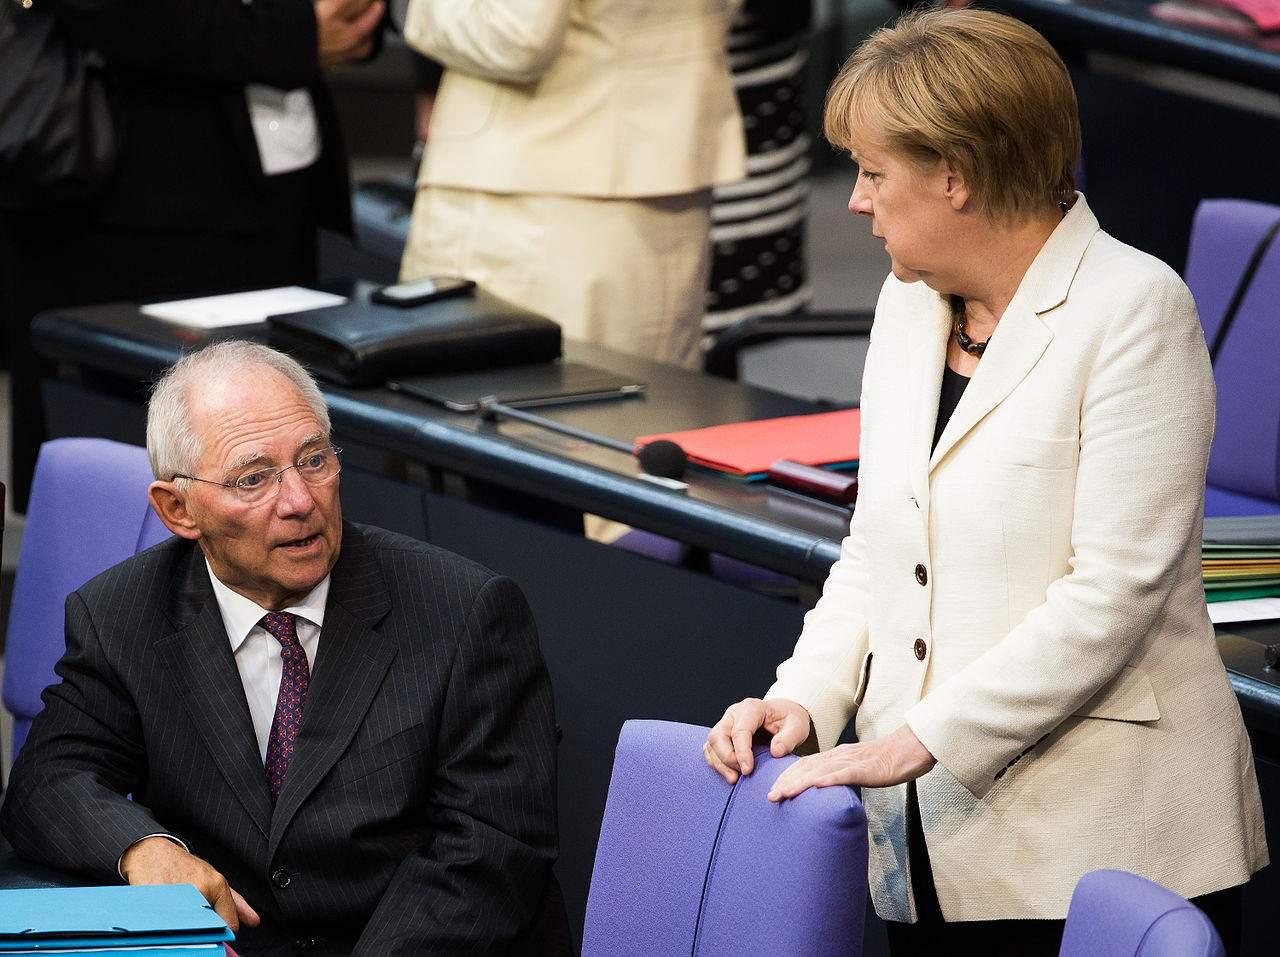 Schäuble Merkel Flüchtlinge